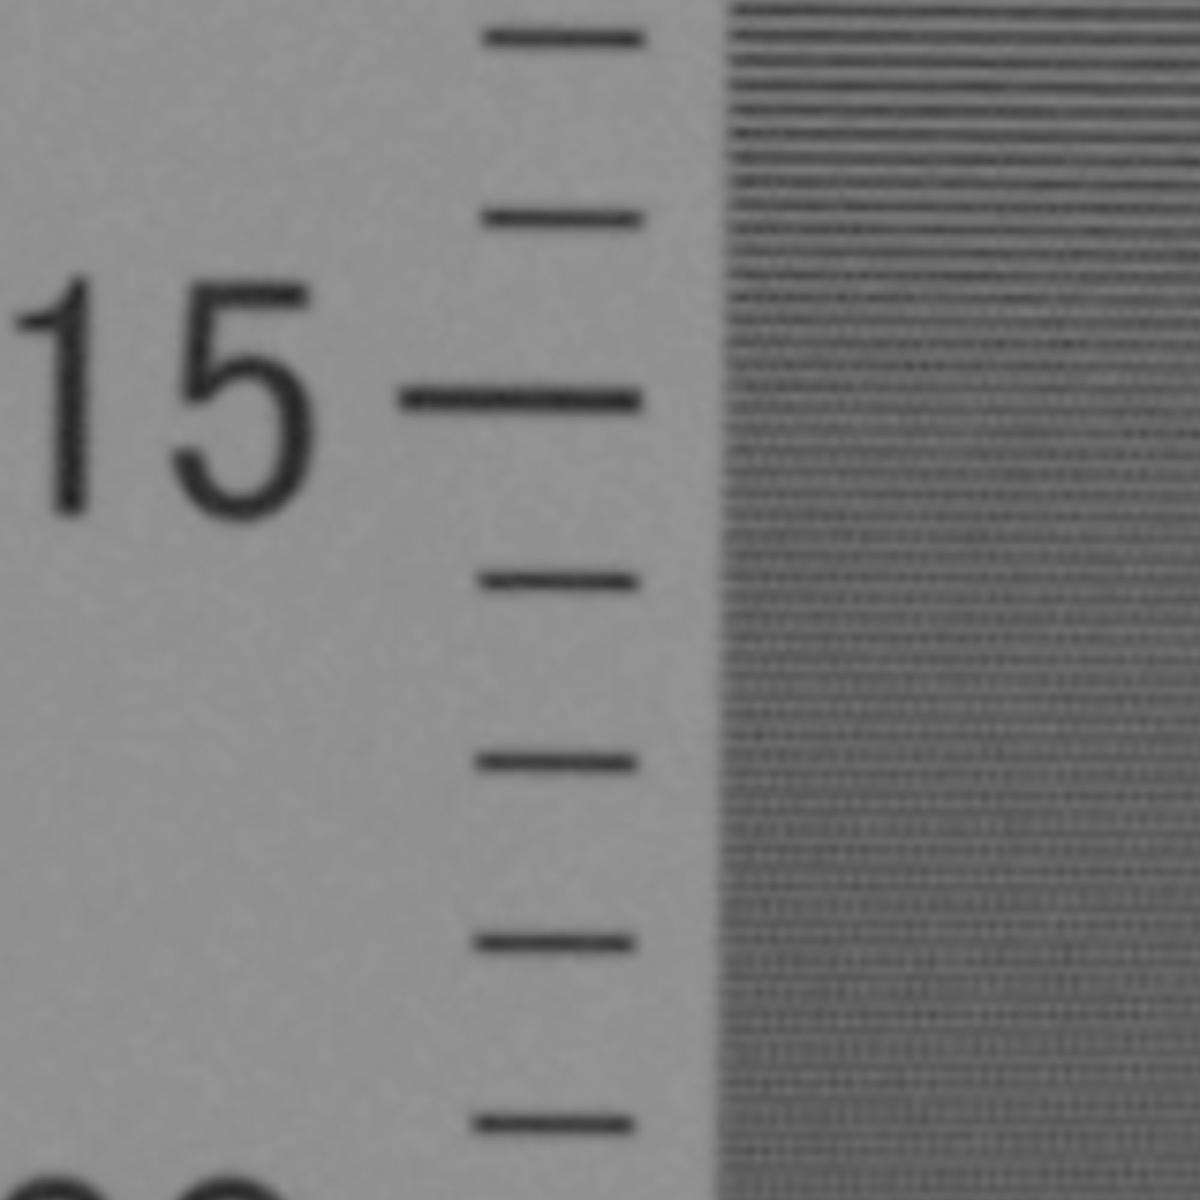 f:id:sumizoon:20210116152625j:plain